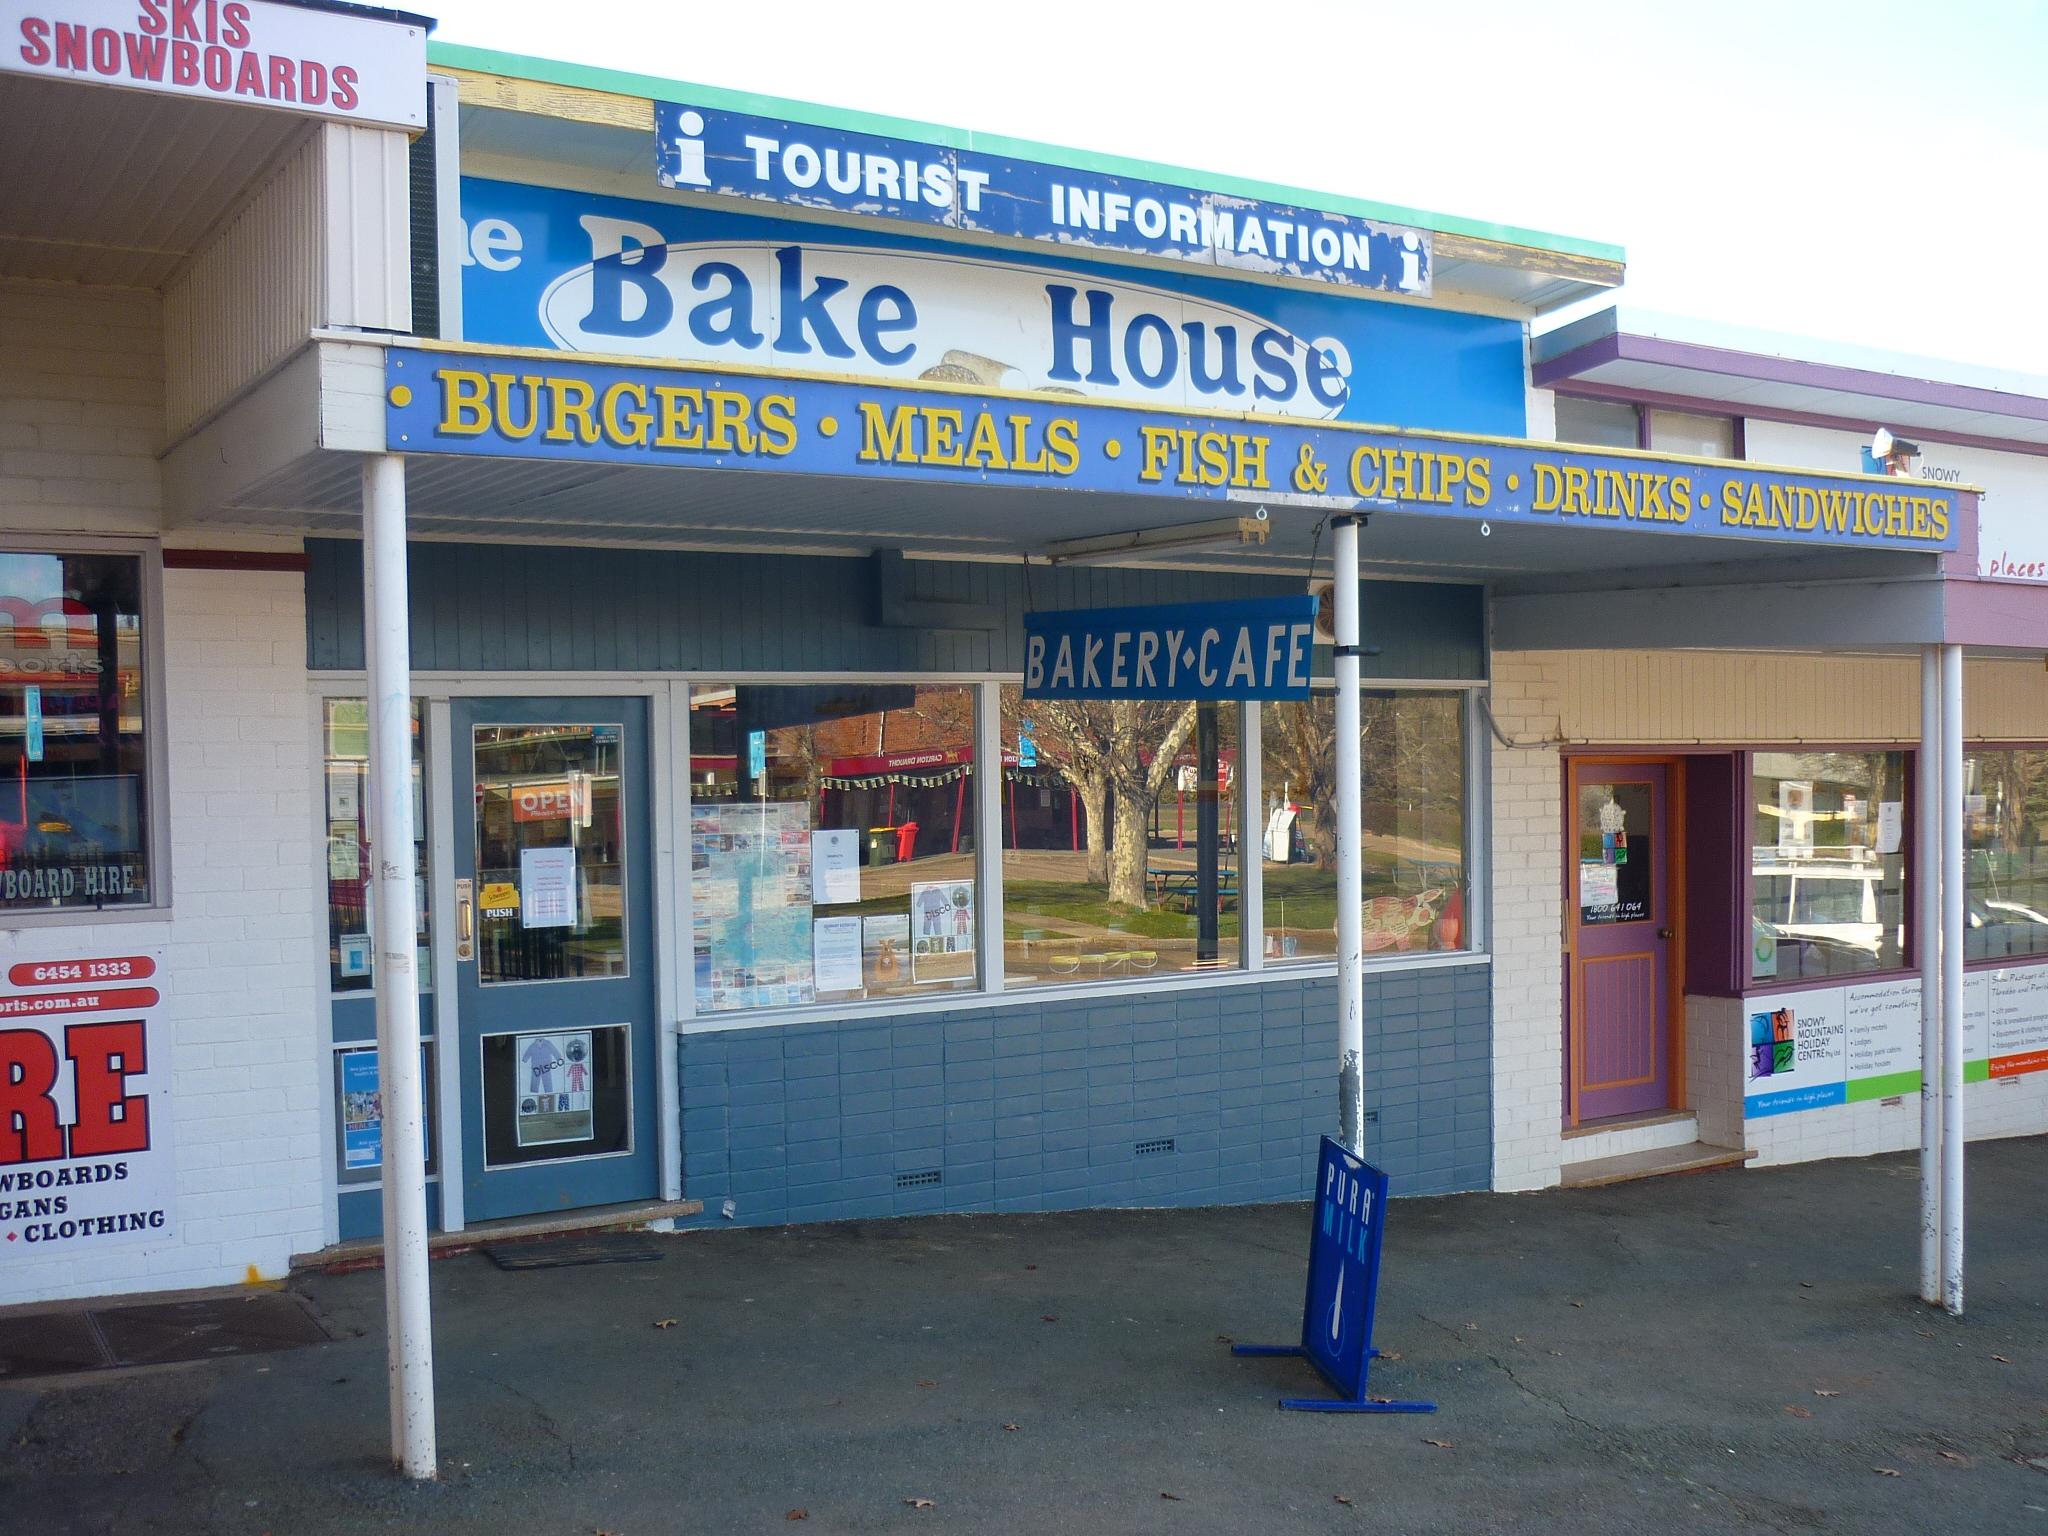 11 Denison Street, Adaminaby NSW 2629 - Studio For Sale | Domain